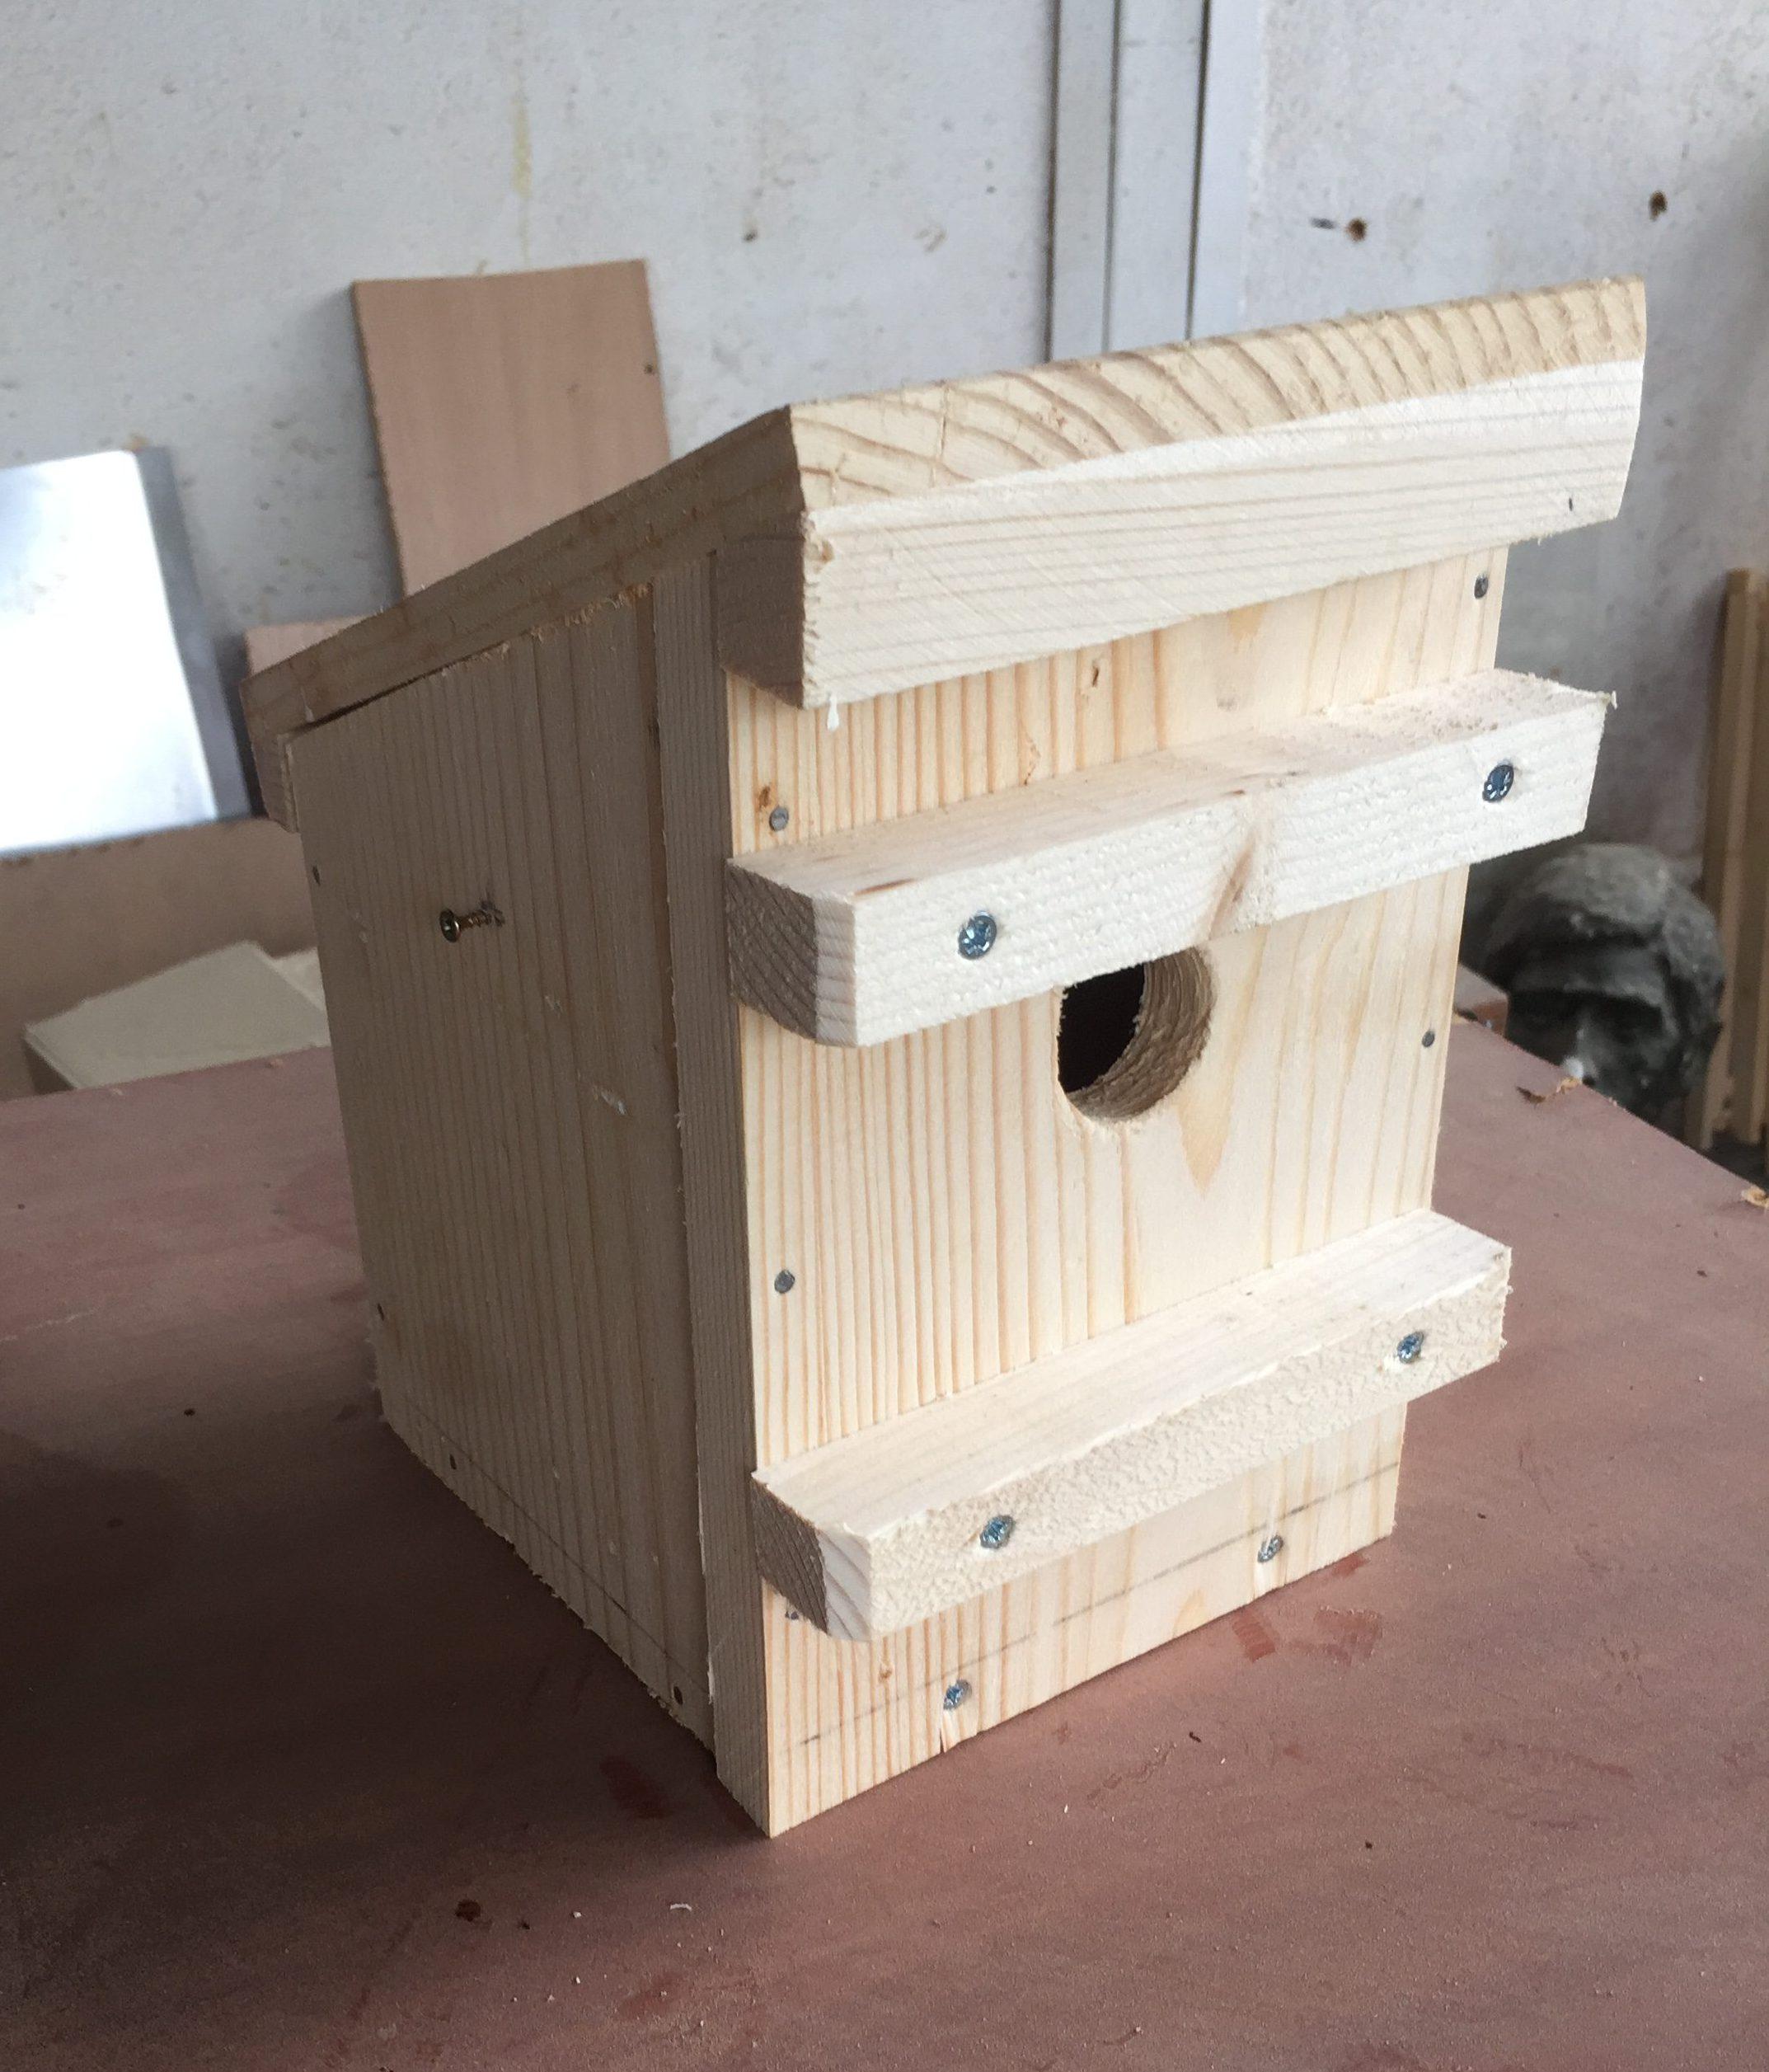 The PTES funded nest box (Photo: Svetlana Miteva)